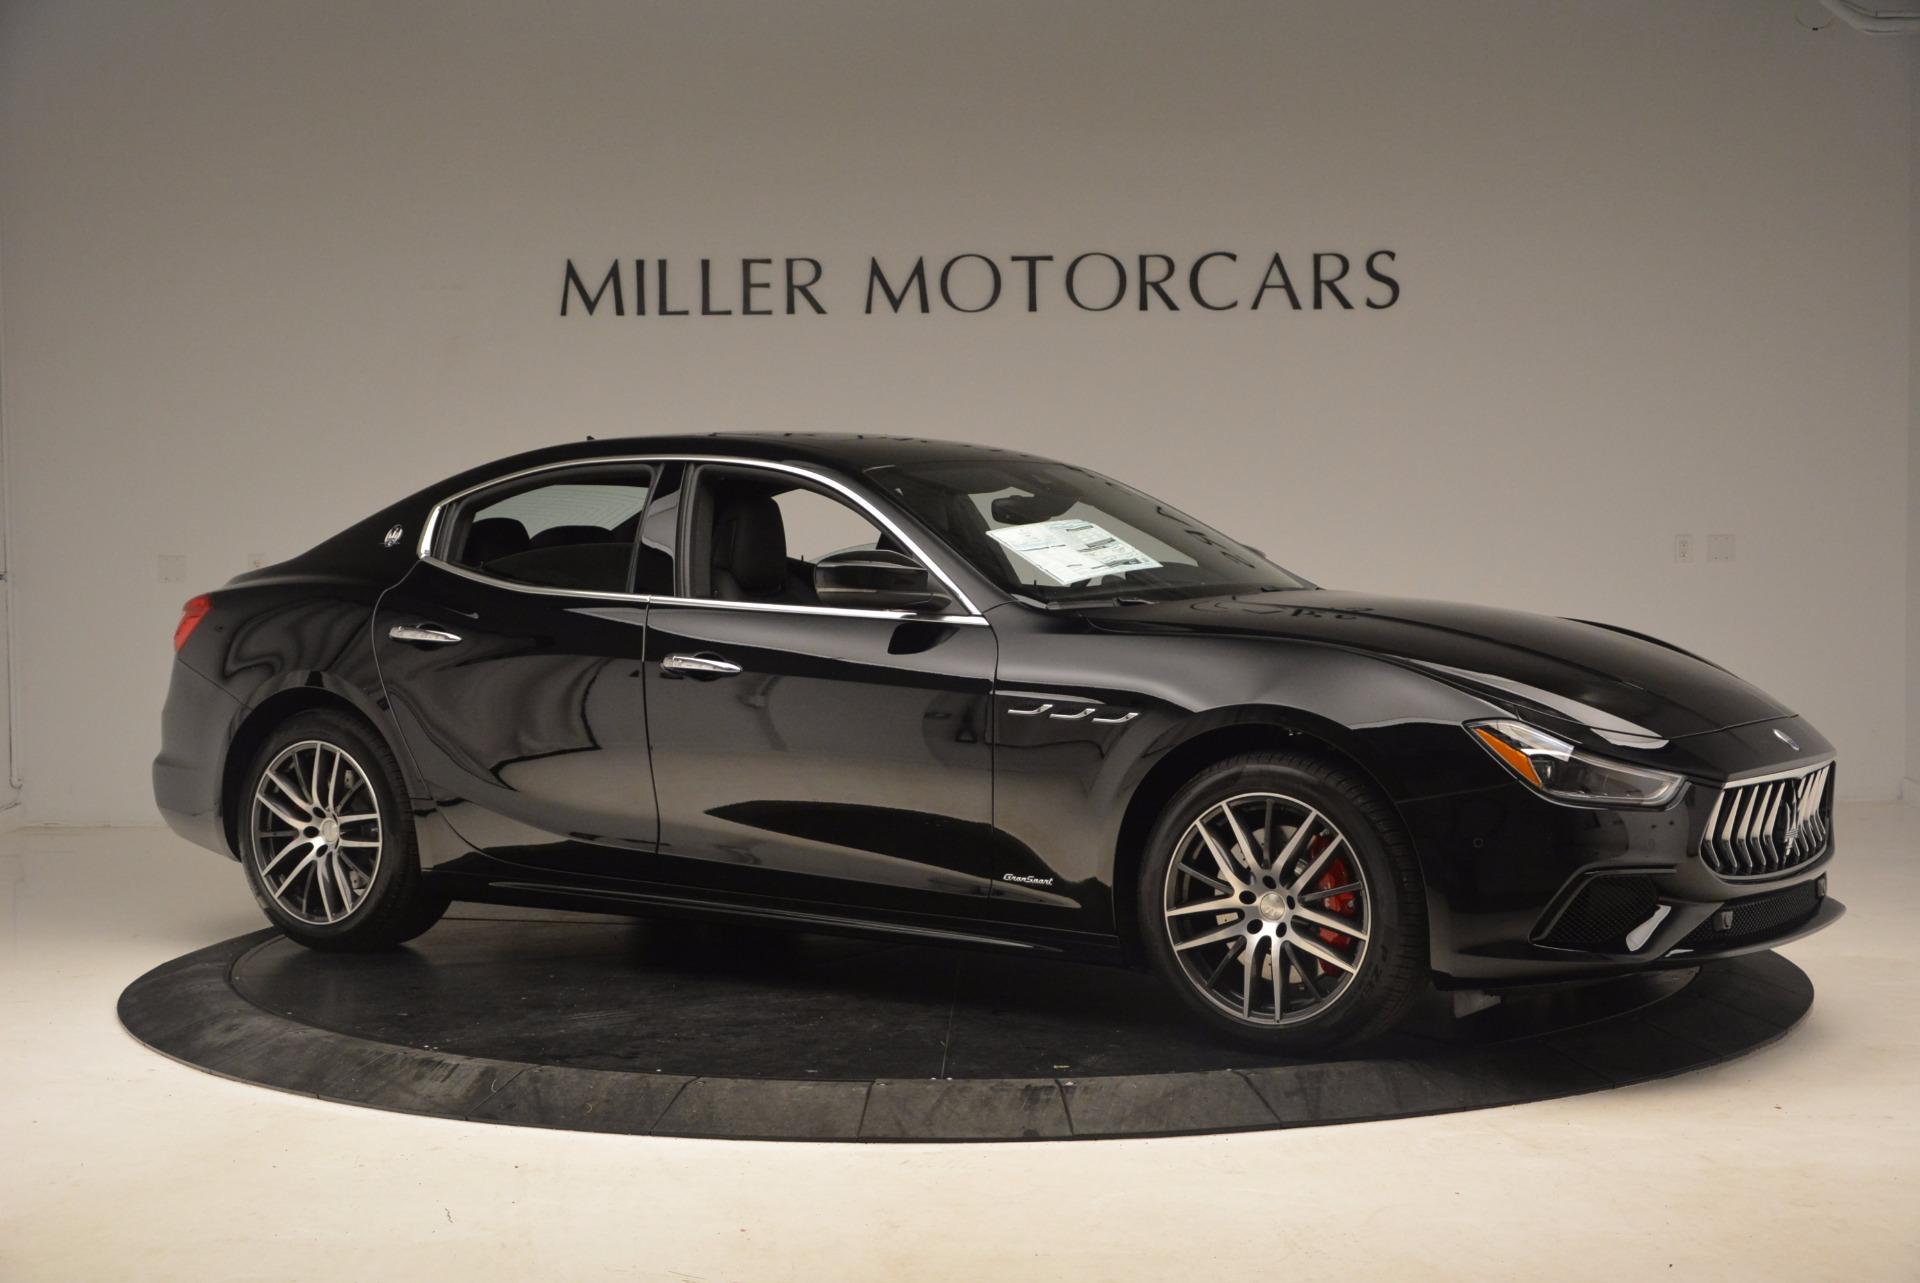 Used 2018 Maserati Ghibli S Q4 Gransport For Sale In Westport, CT 1568_p10